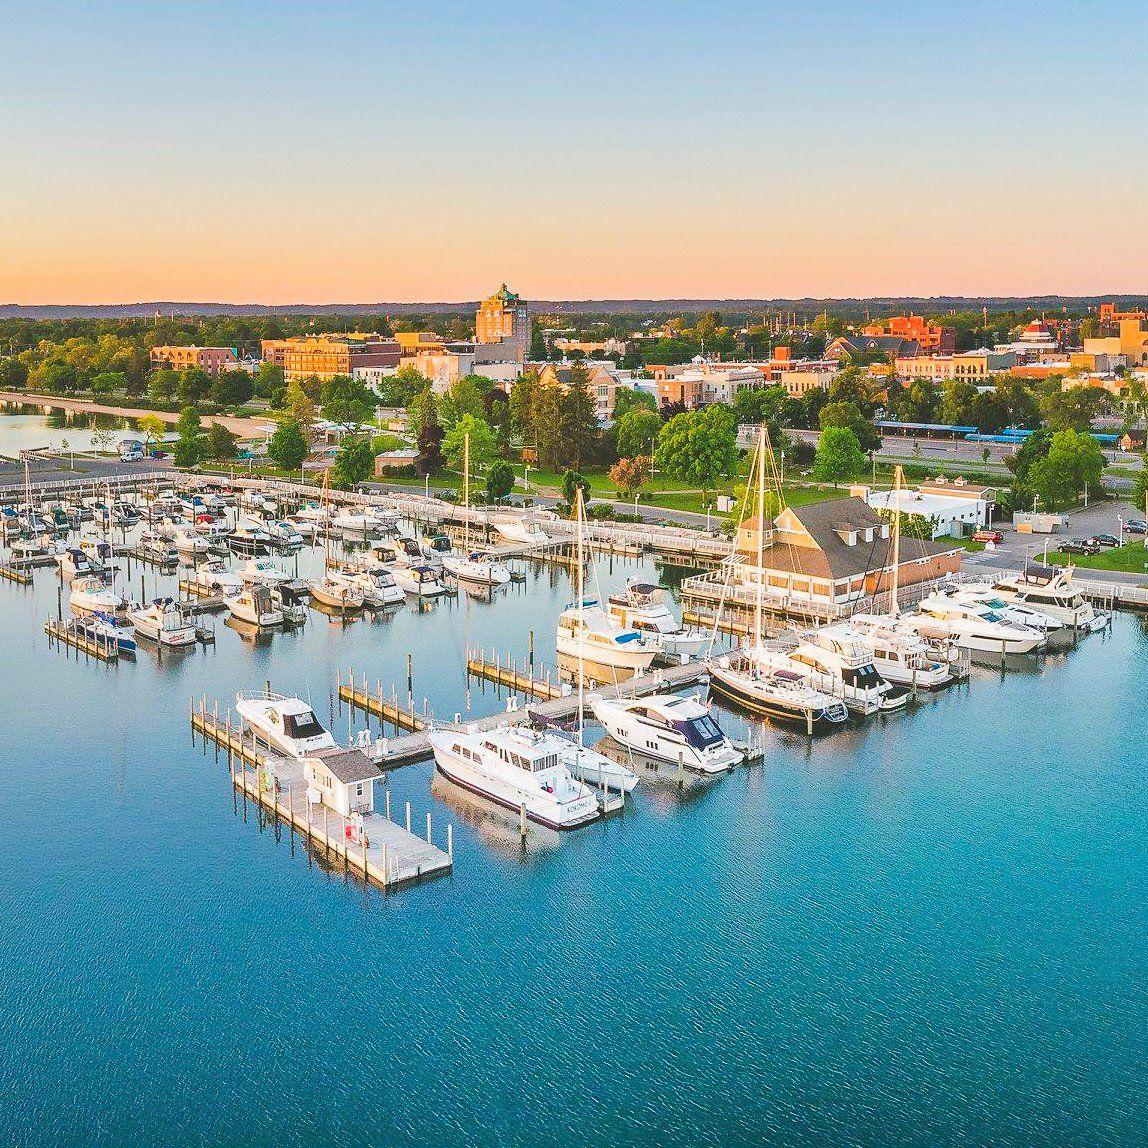 Weekend Getaway To Traverse City, Michigan: The Best ...